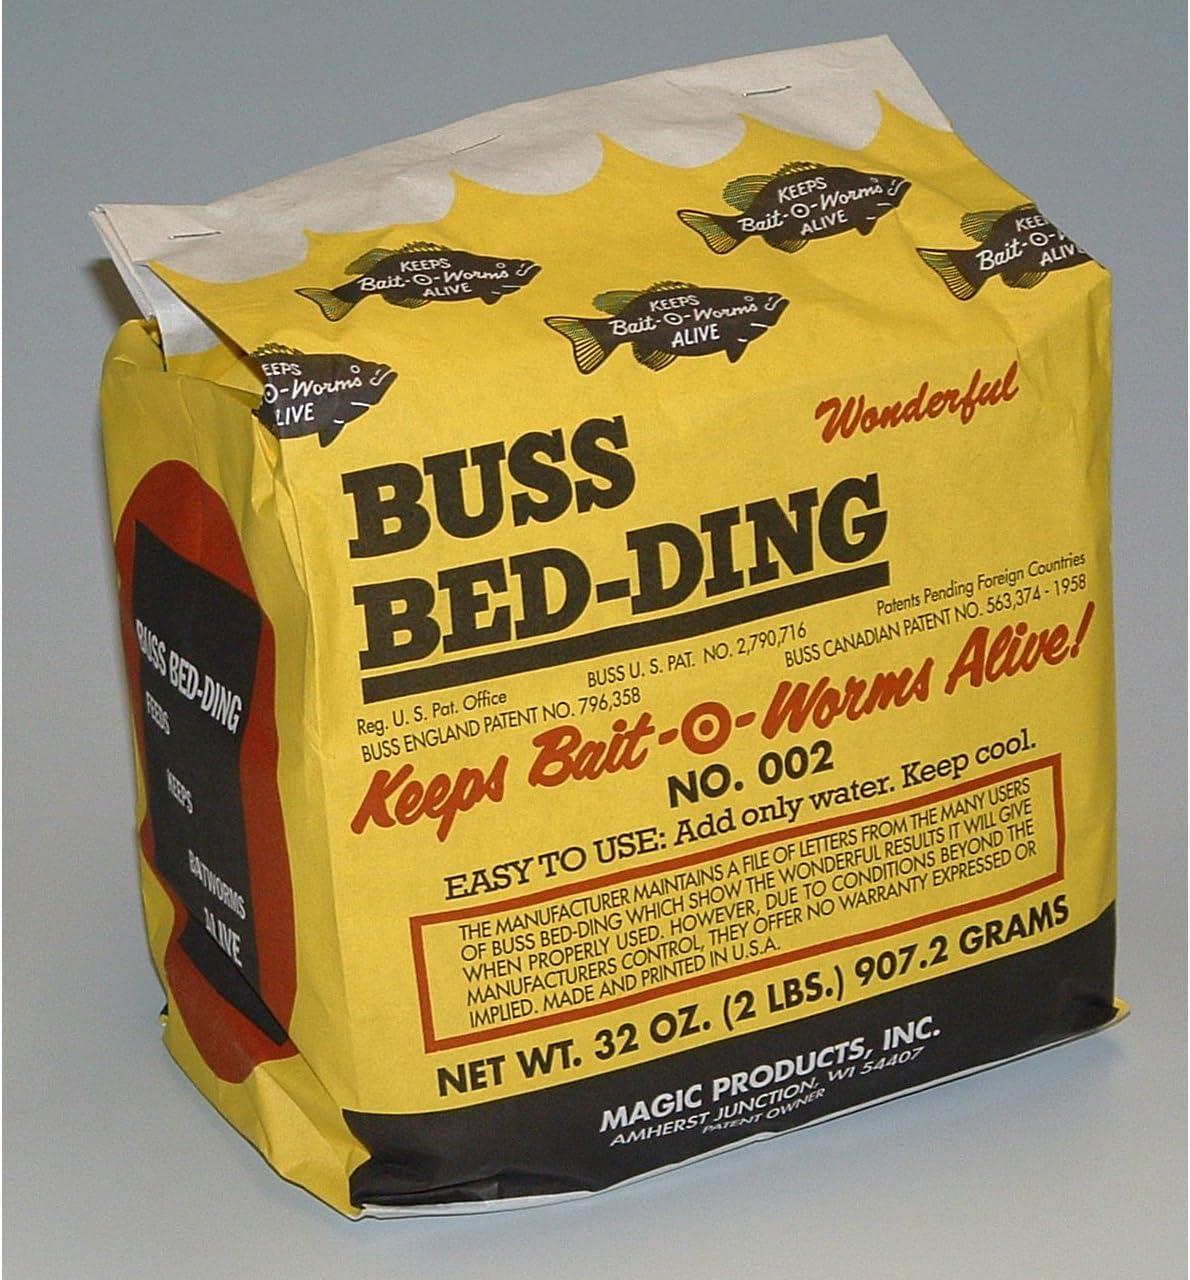 Magic Bait 2-Pound Buss Bedding Bag, Yellow